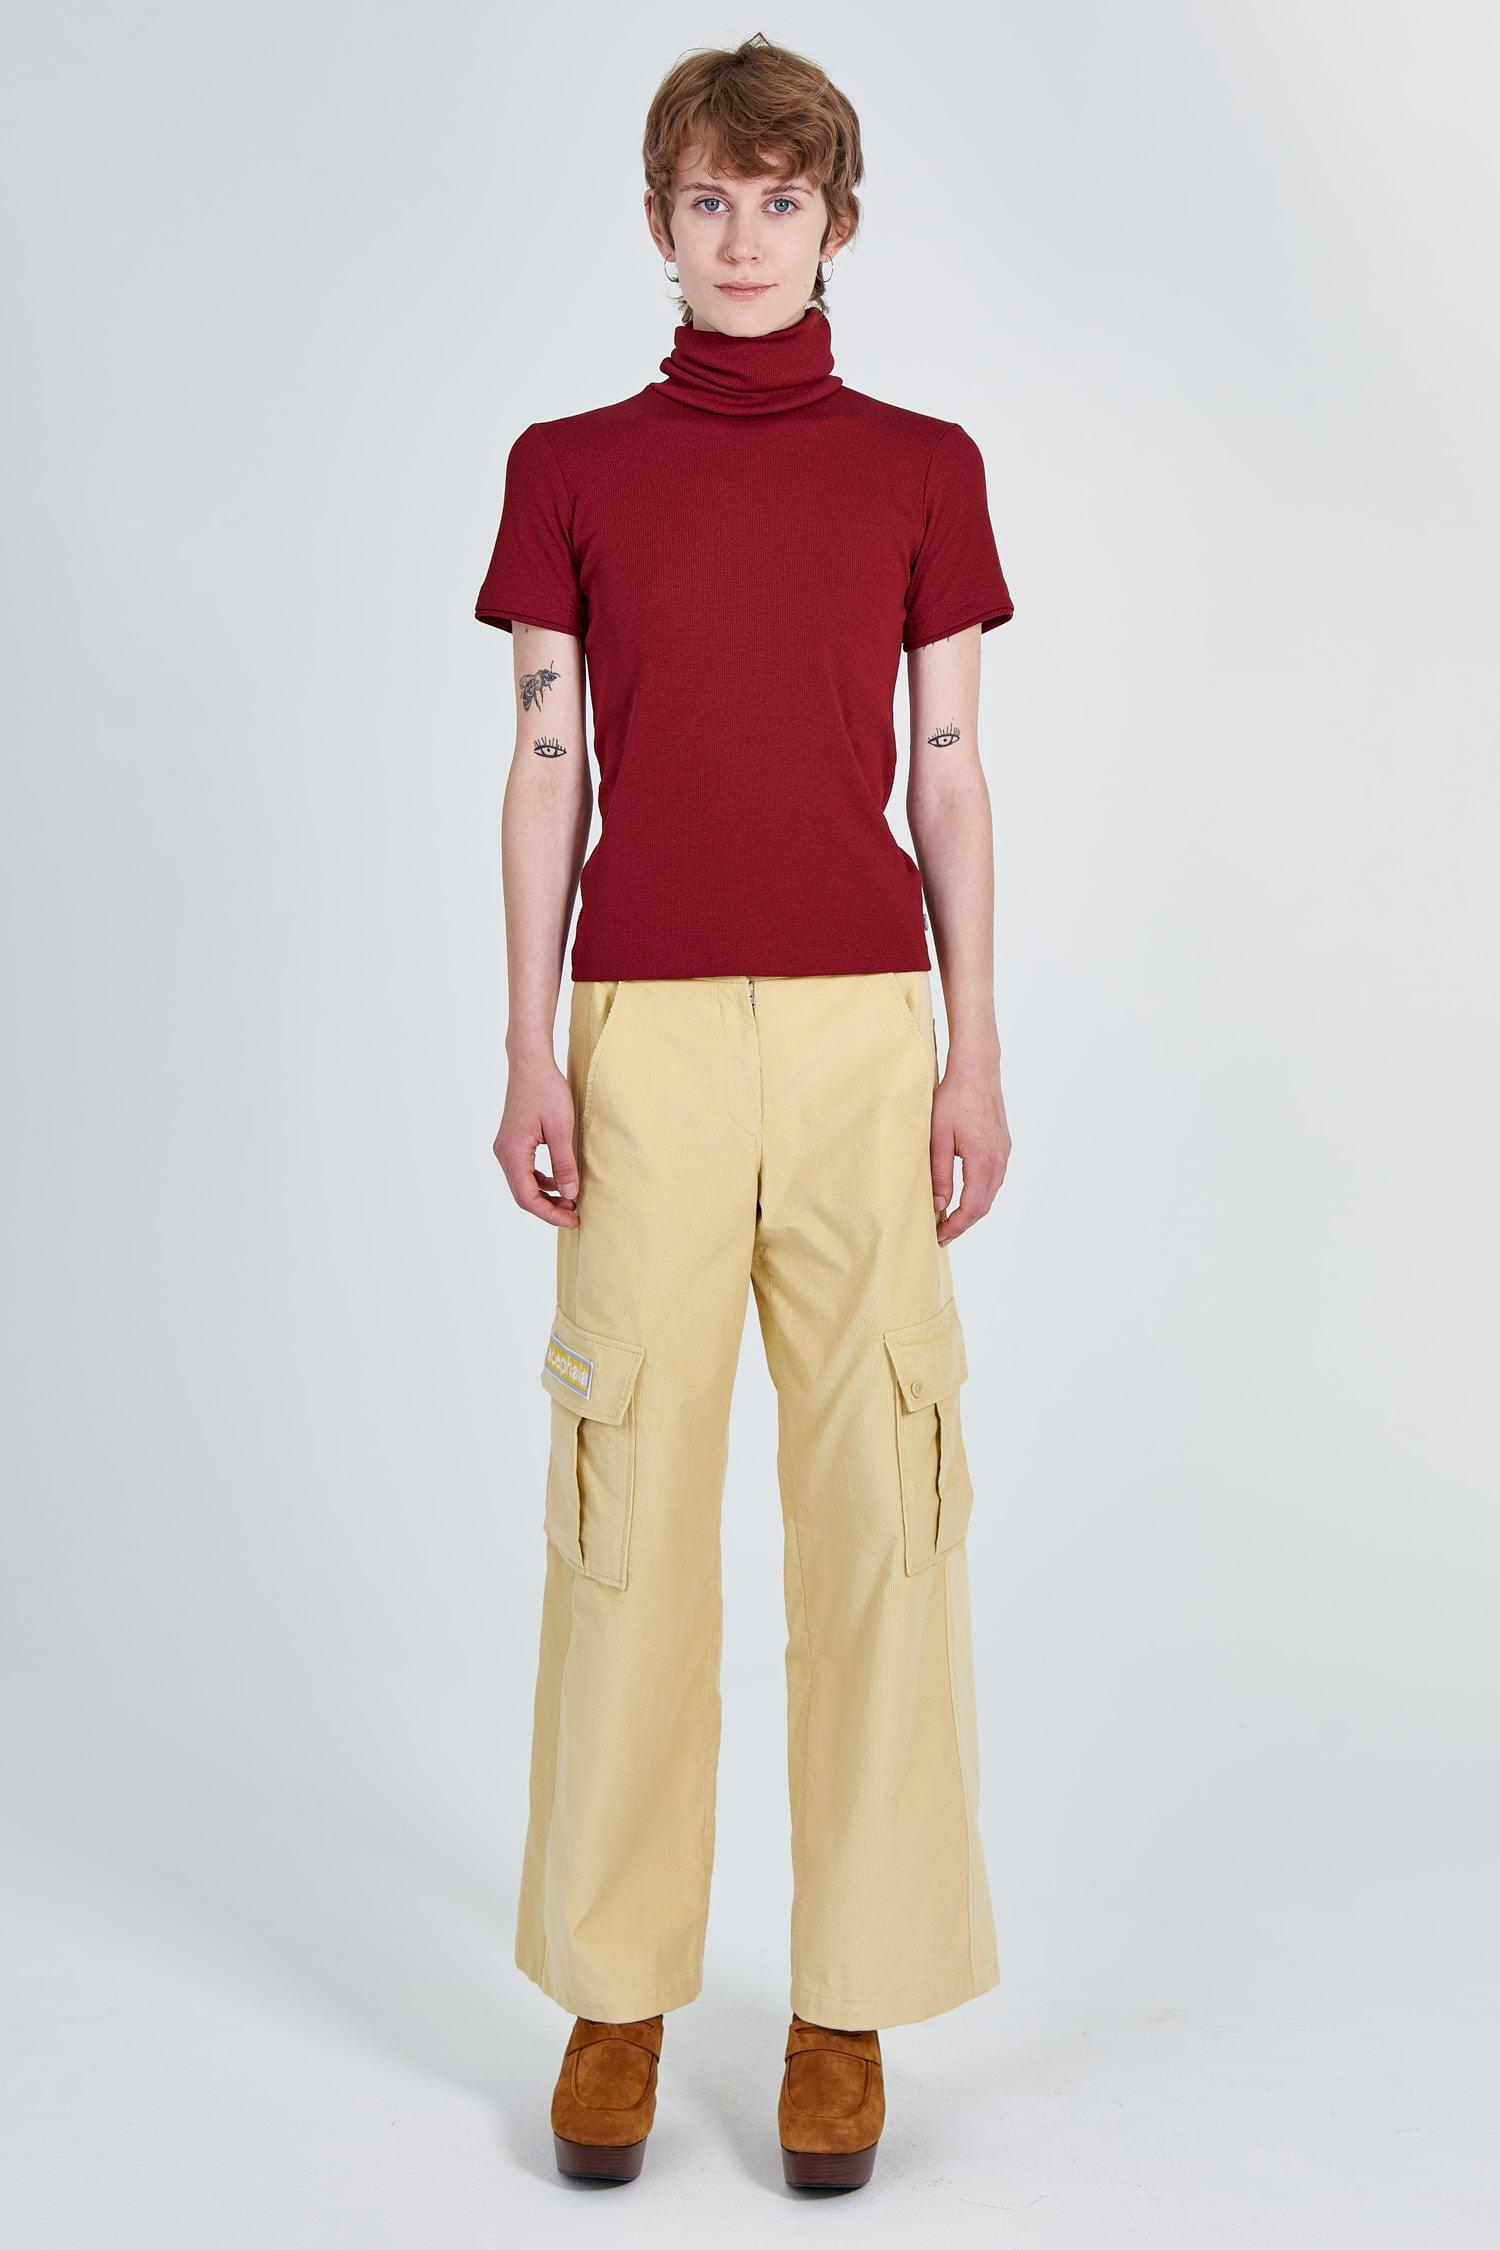 Acephala Fw 2020 21 Red Turtleneck Yellow Corduroy Trousers